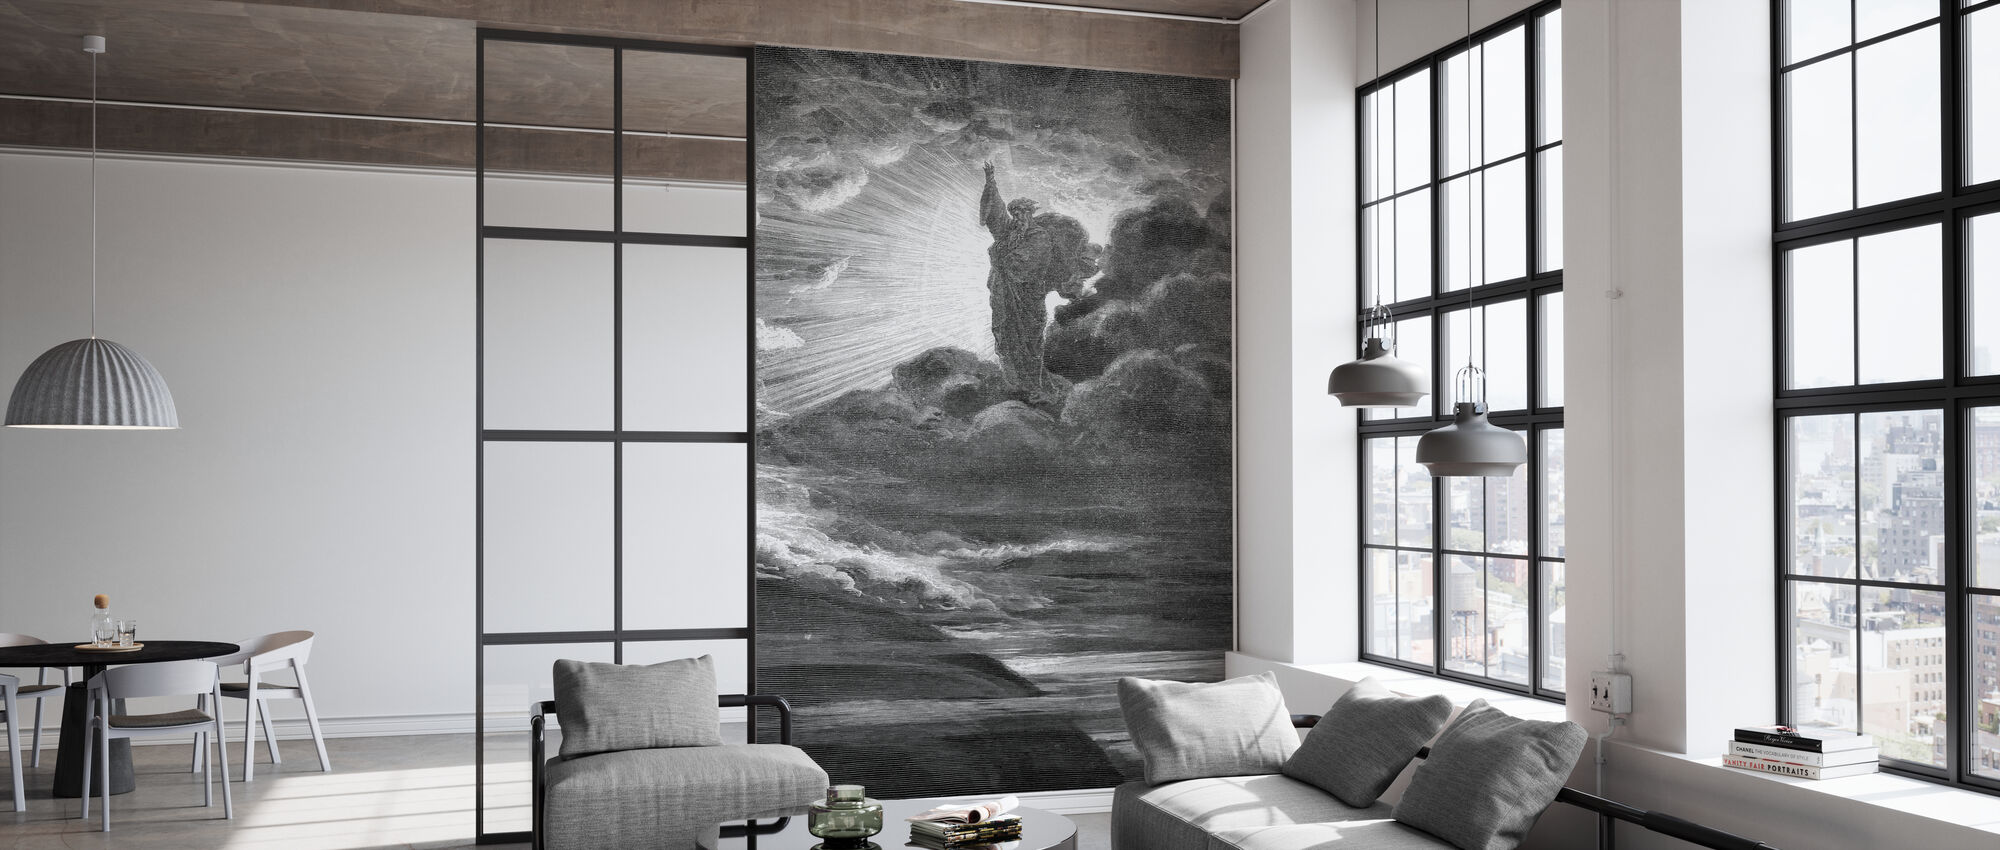 Skapelsen - Gustave Dore - Behang - Kantoor